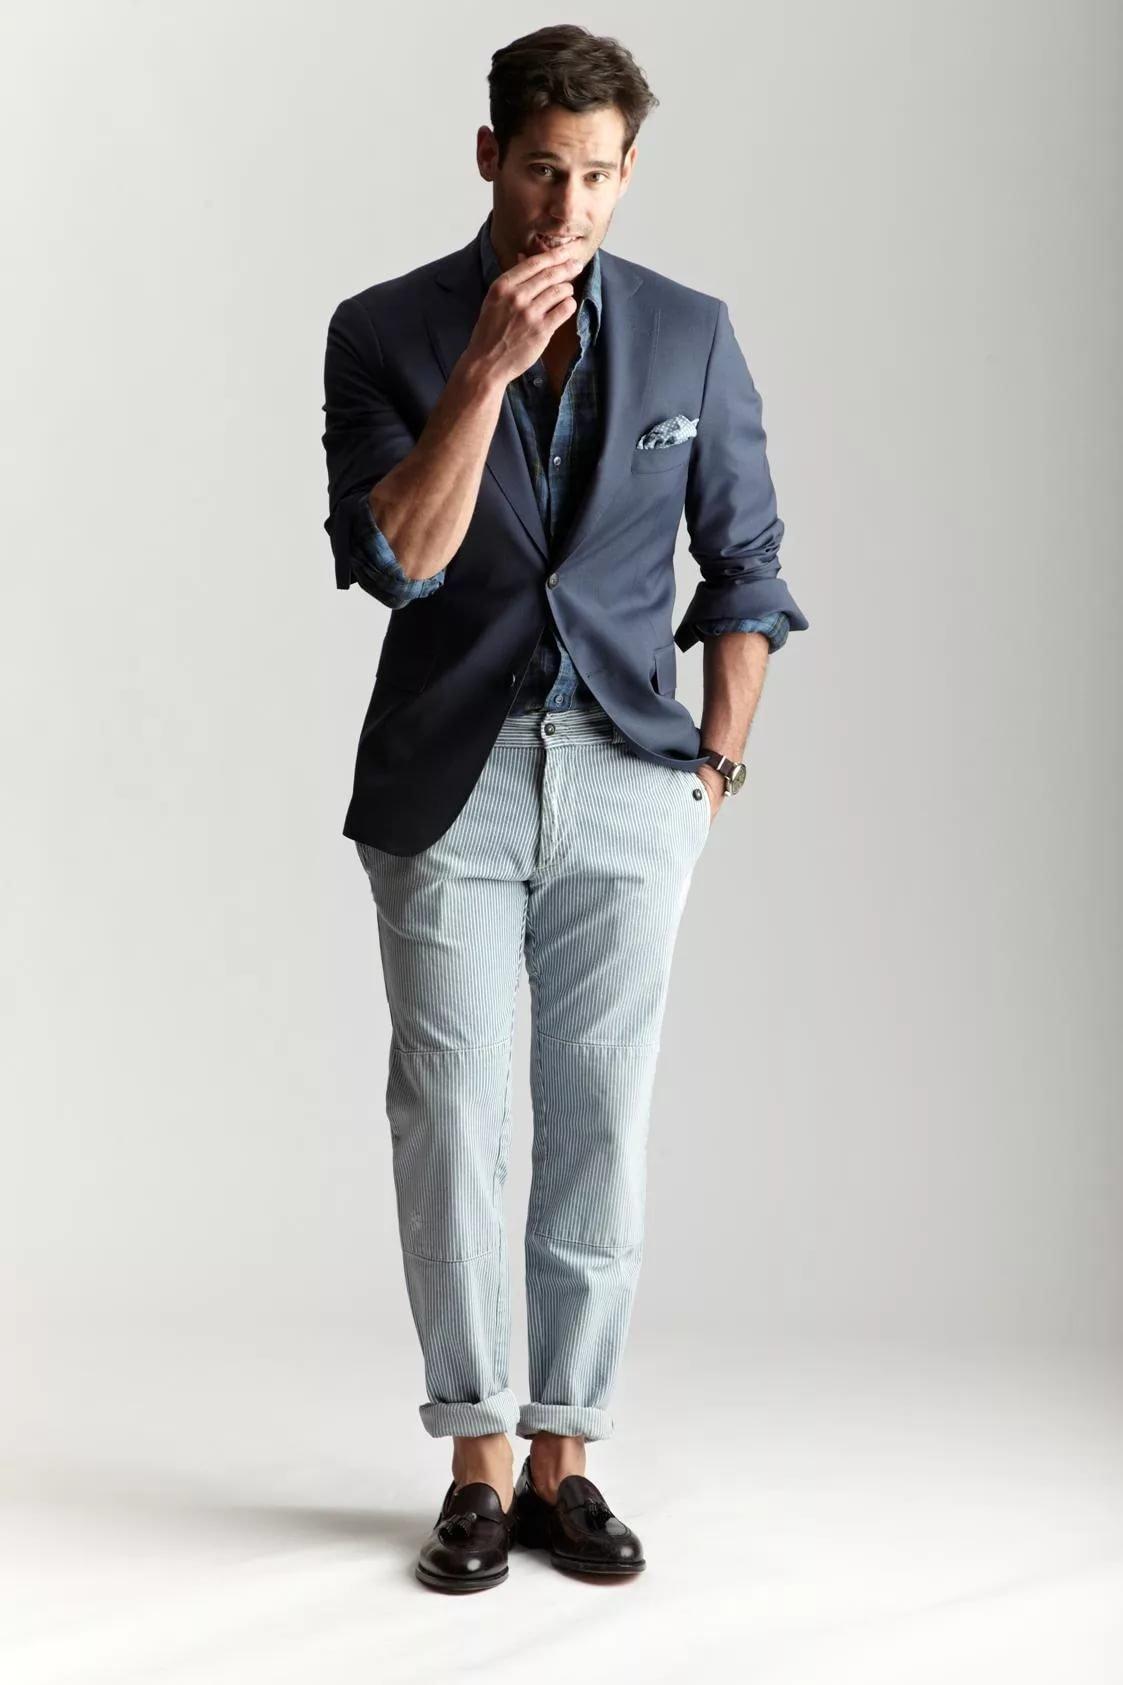 Mens wear fashion catolouge AR Rahman Gallery - Home Facebook